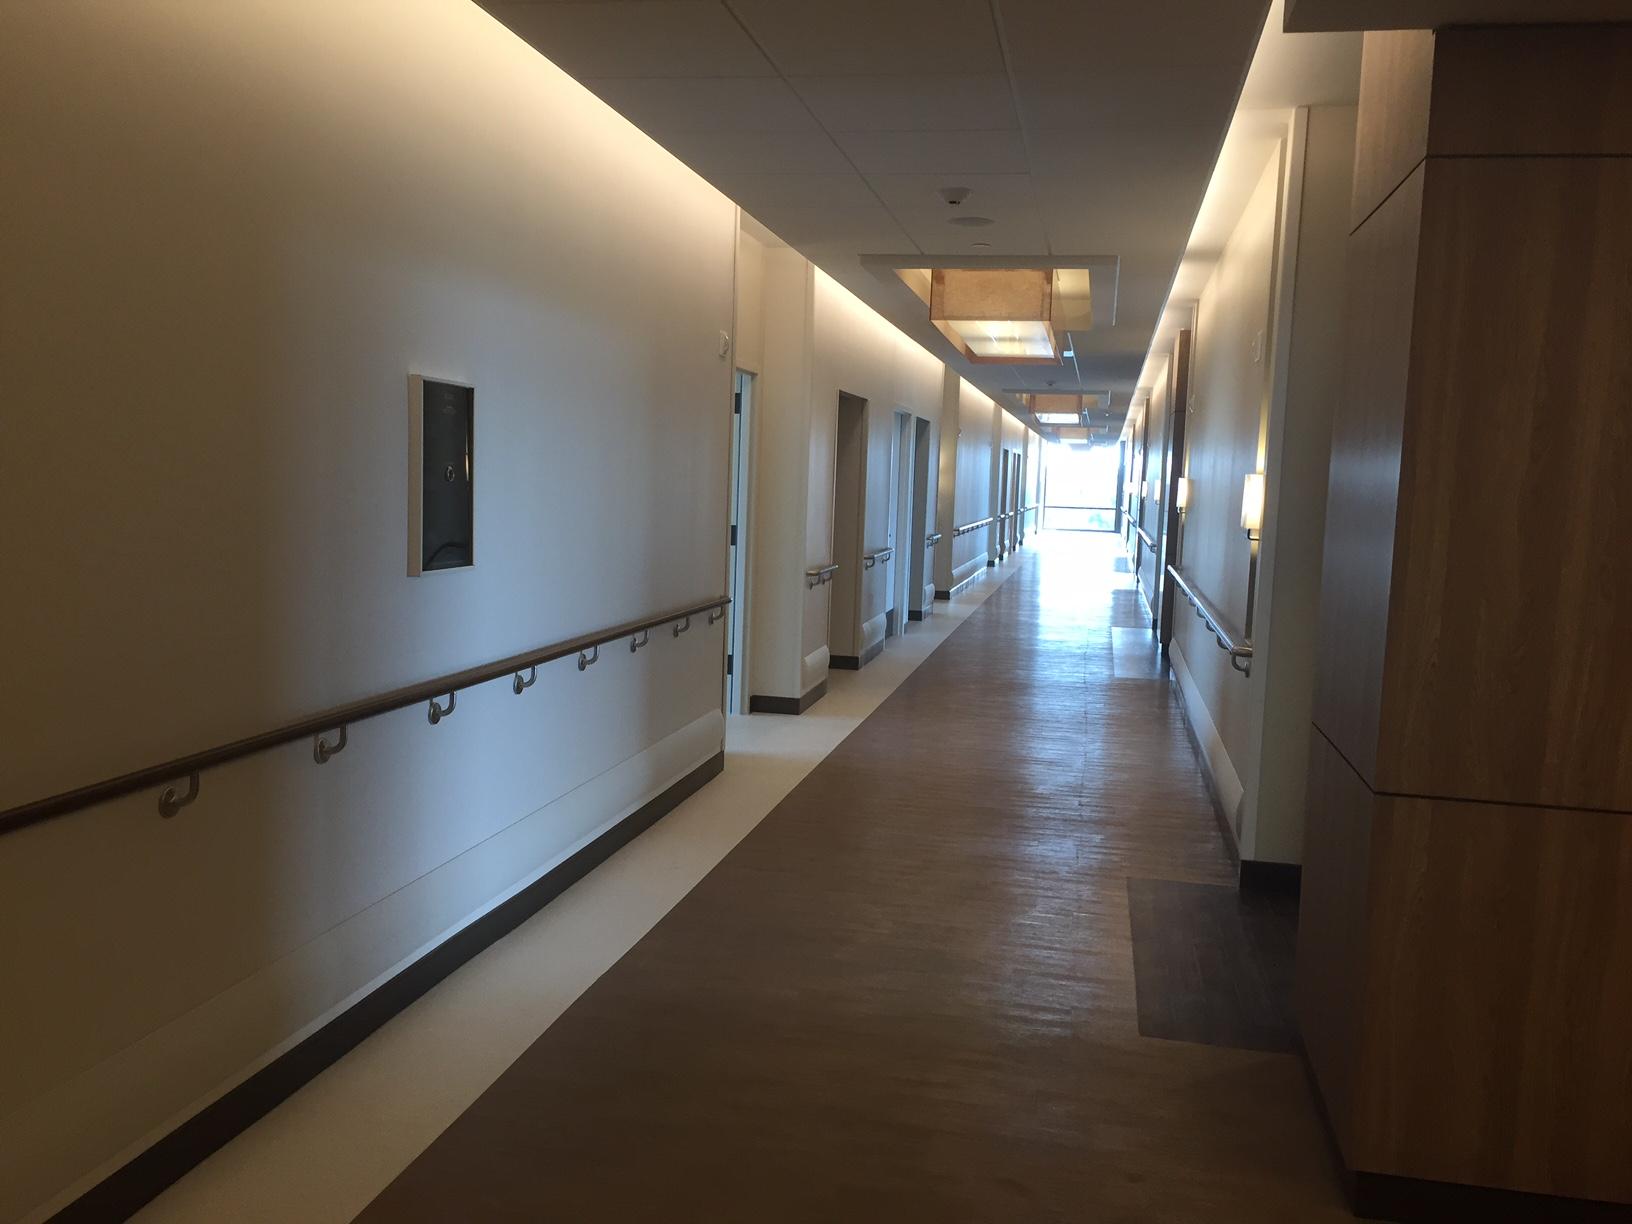 New St. David's Medical Center in North Austin_284743